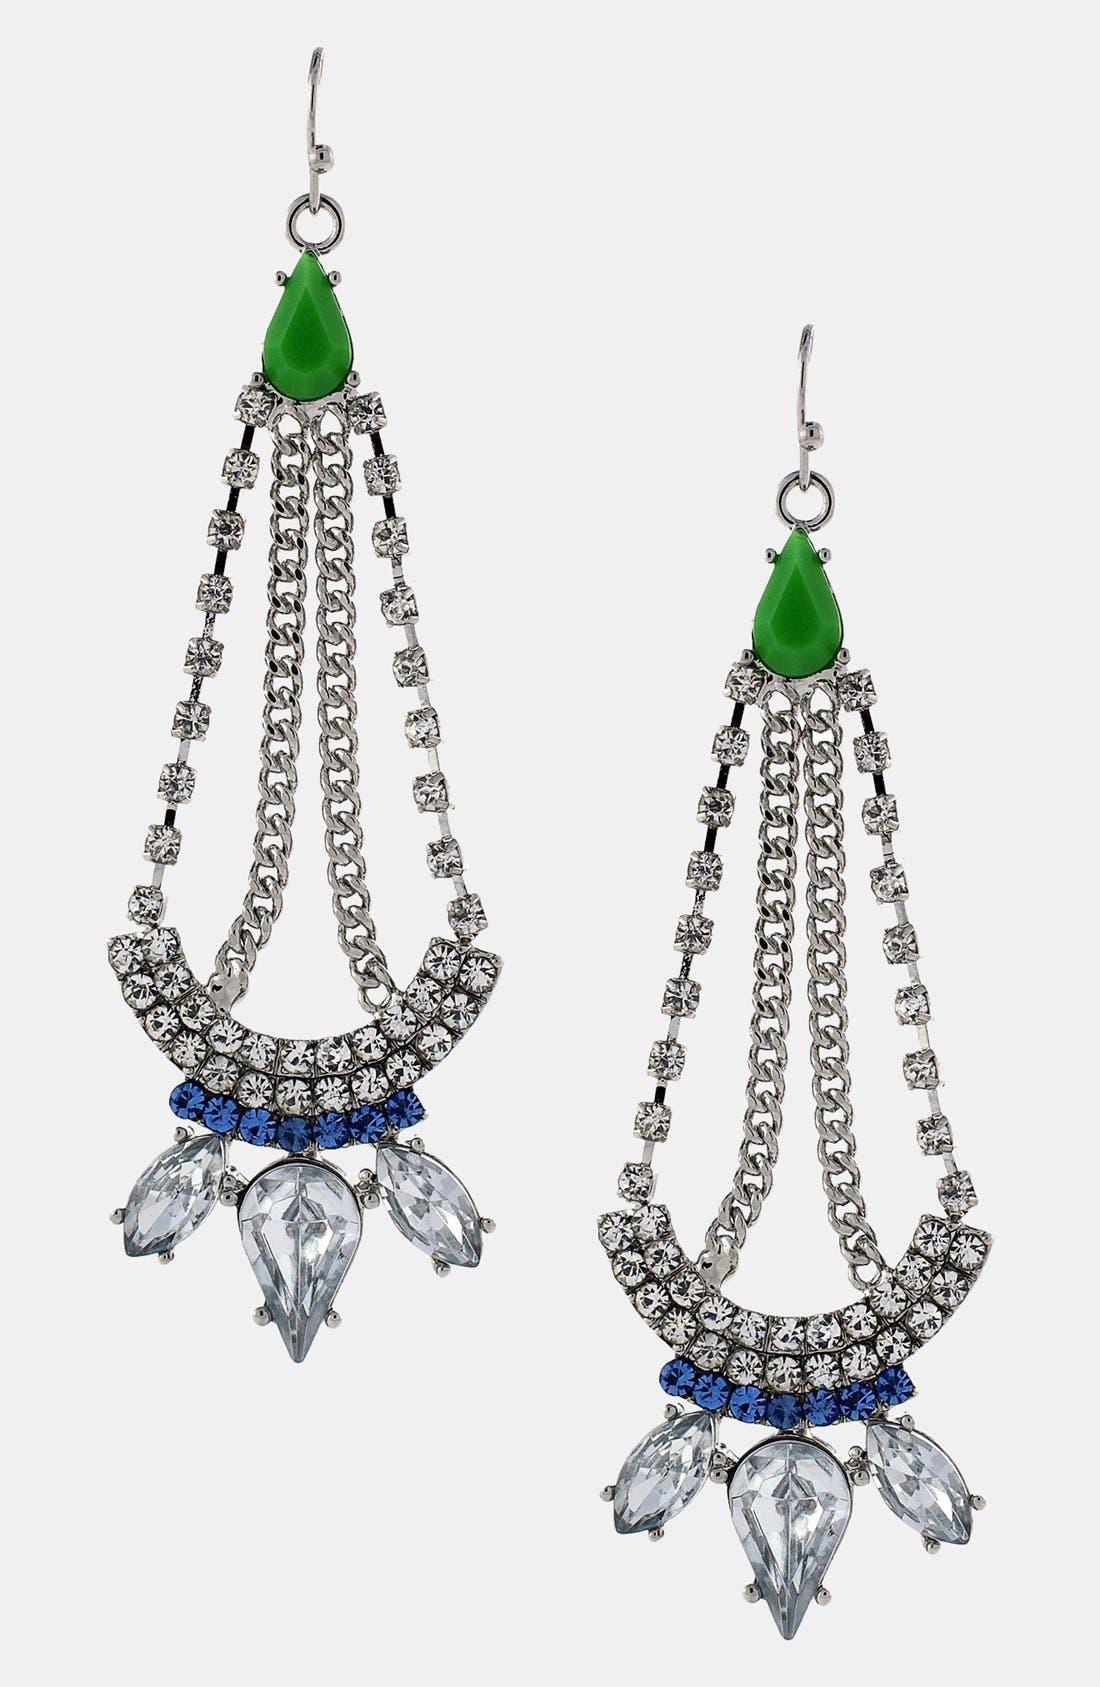 Alternate Image 1 Selected - Jessica Simpson 'Tropic Nights' Chandelier Earrings